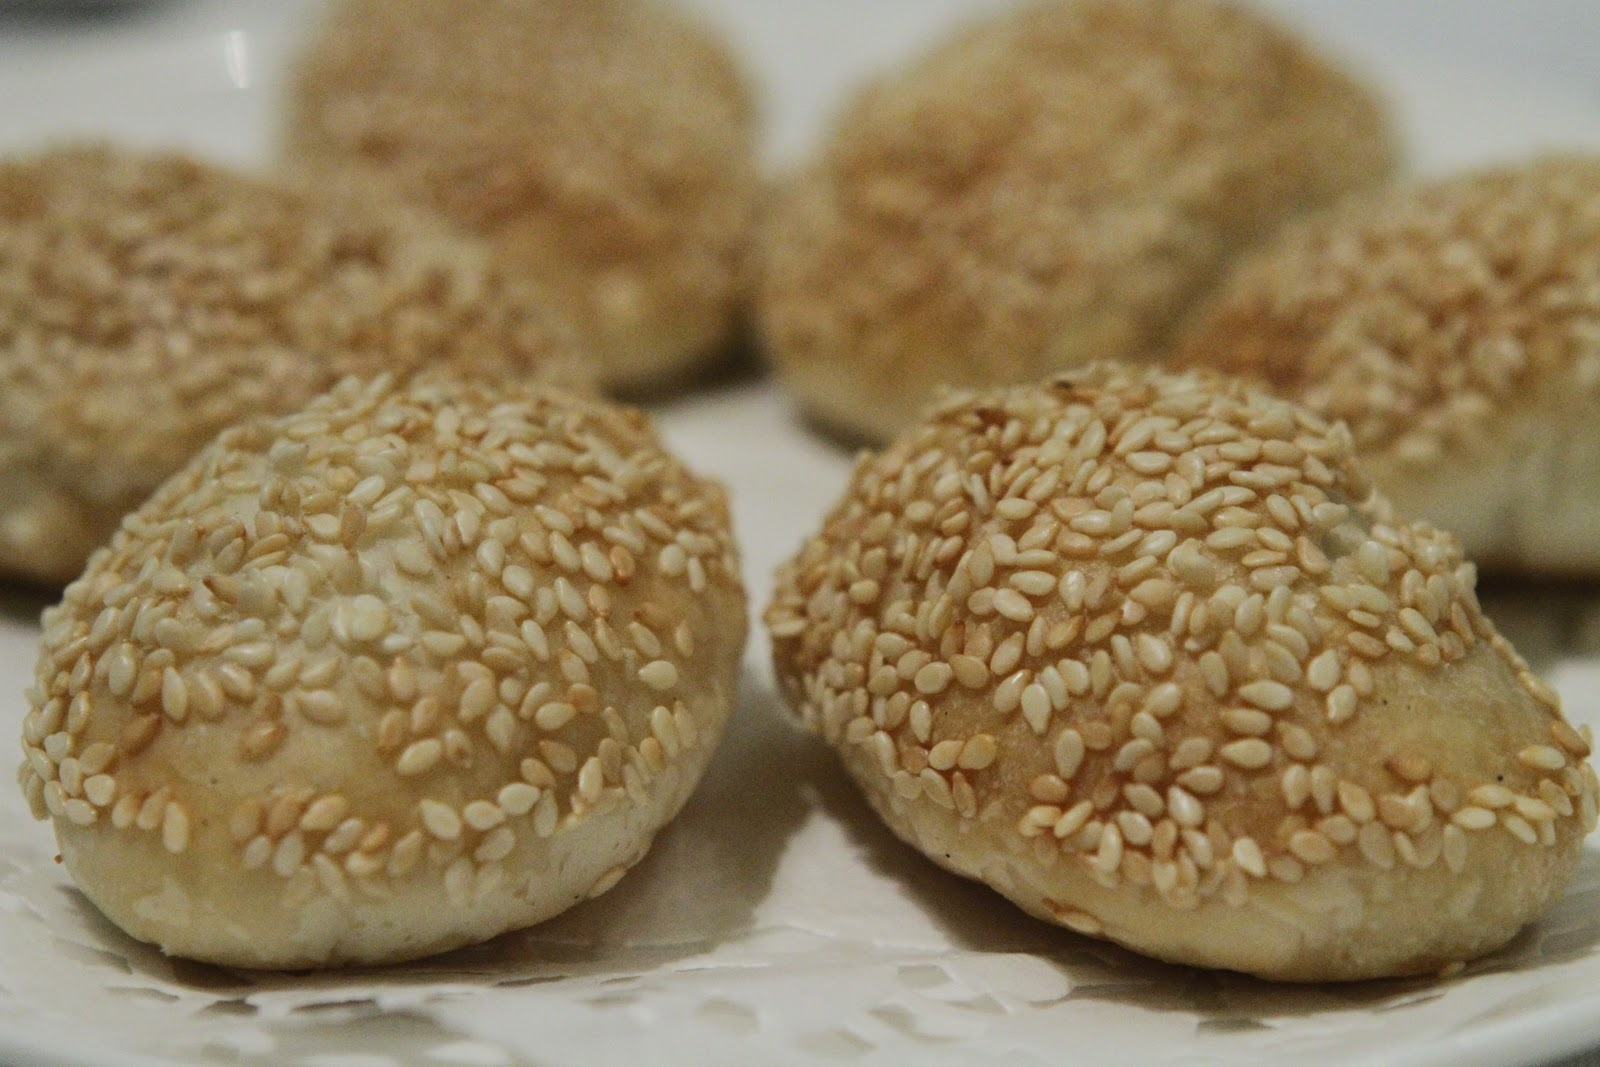 Chinese Sesame Seed Cake